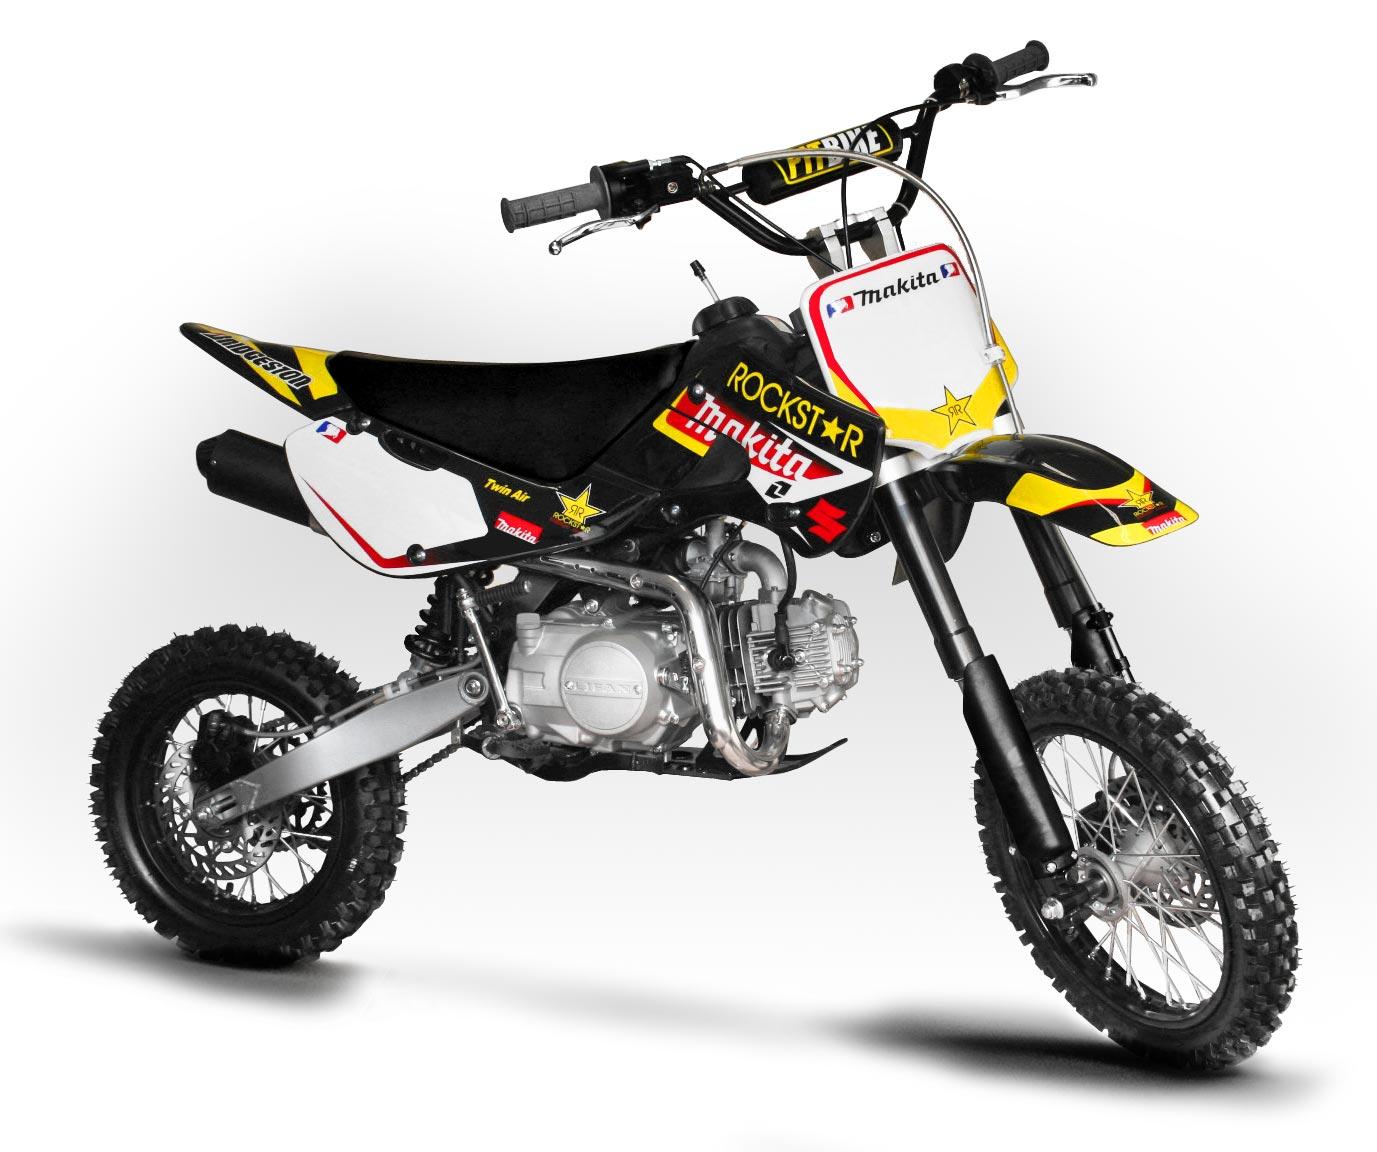 kit decoration klx makita rockstar pour dirt bike pit bike